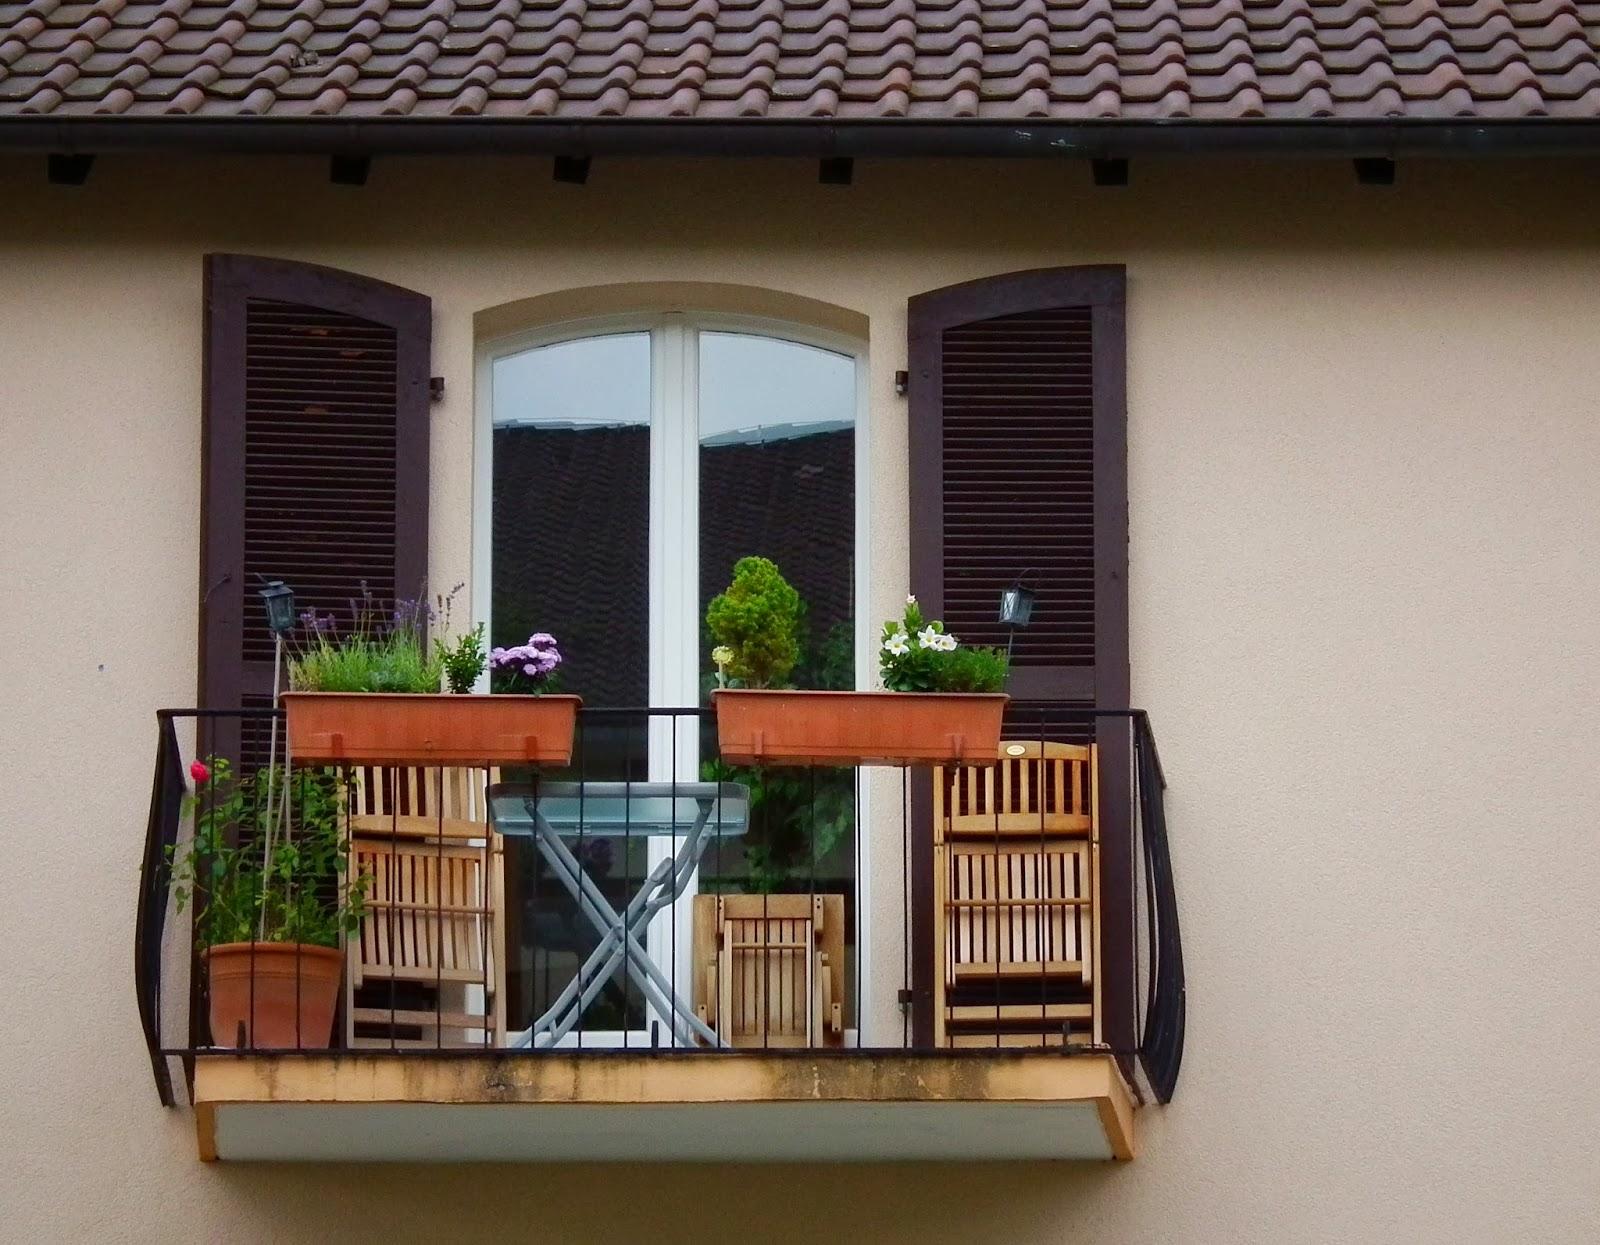 Klein Balkon Inrichten : Klein balkon inrichten i love my interior